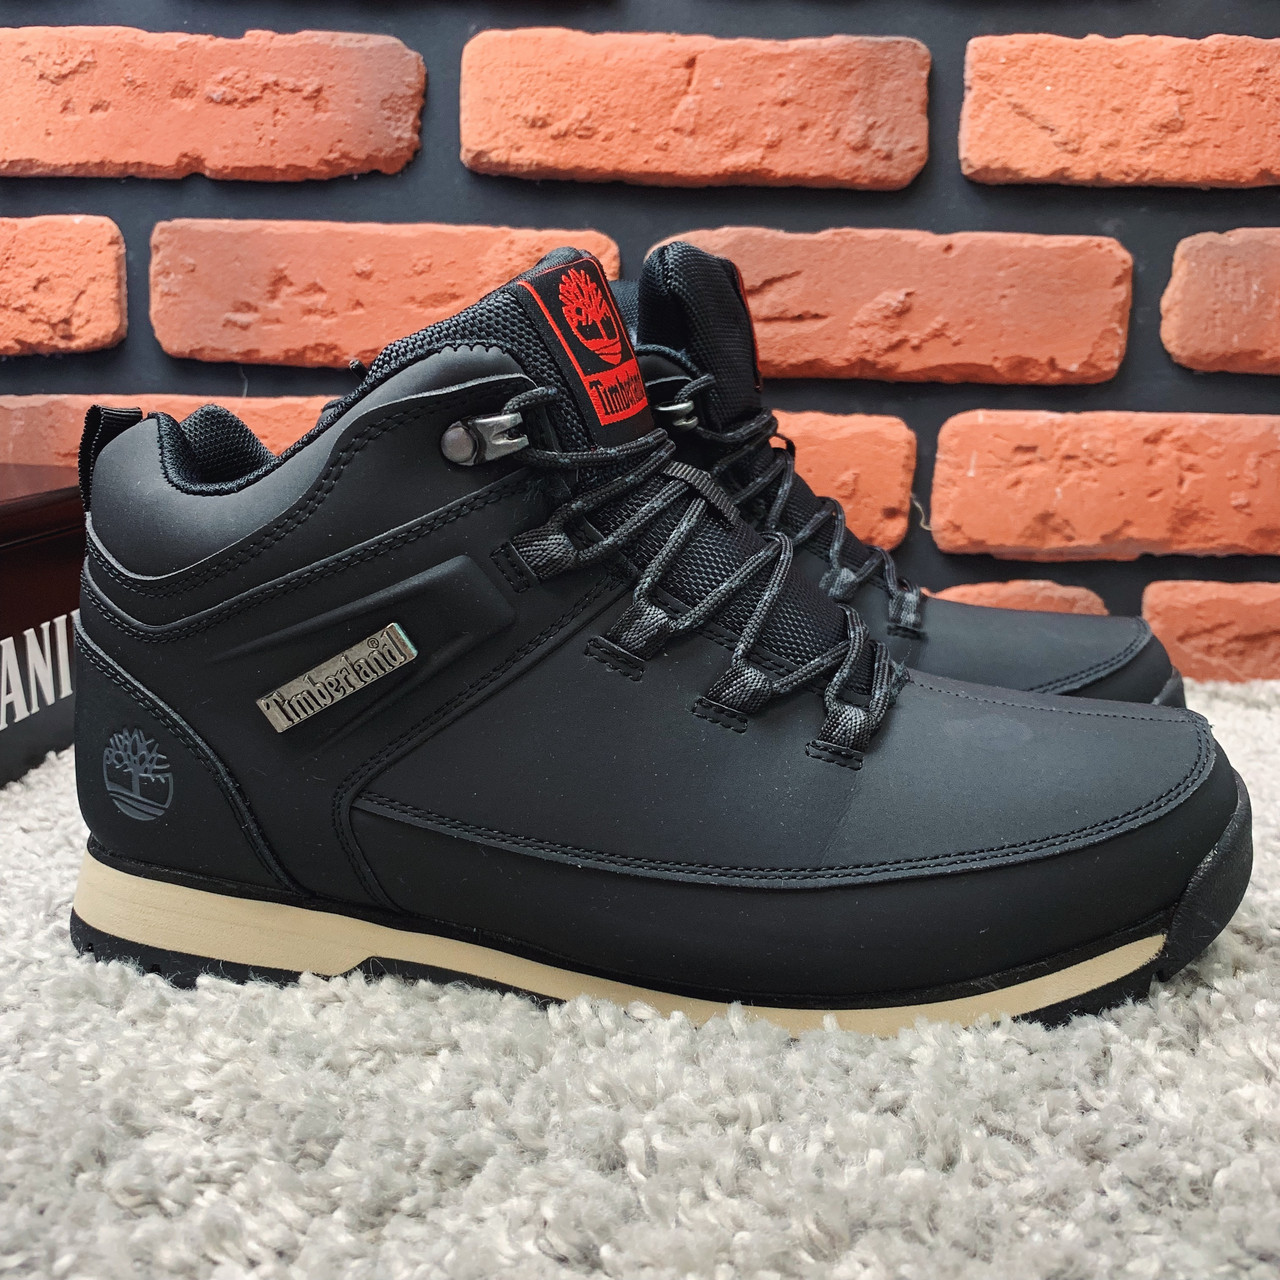 Зимние ботинки (на меху) мужские Timberland 11-002 ⏩ [ 41,42,43.43,44,44,46 ]